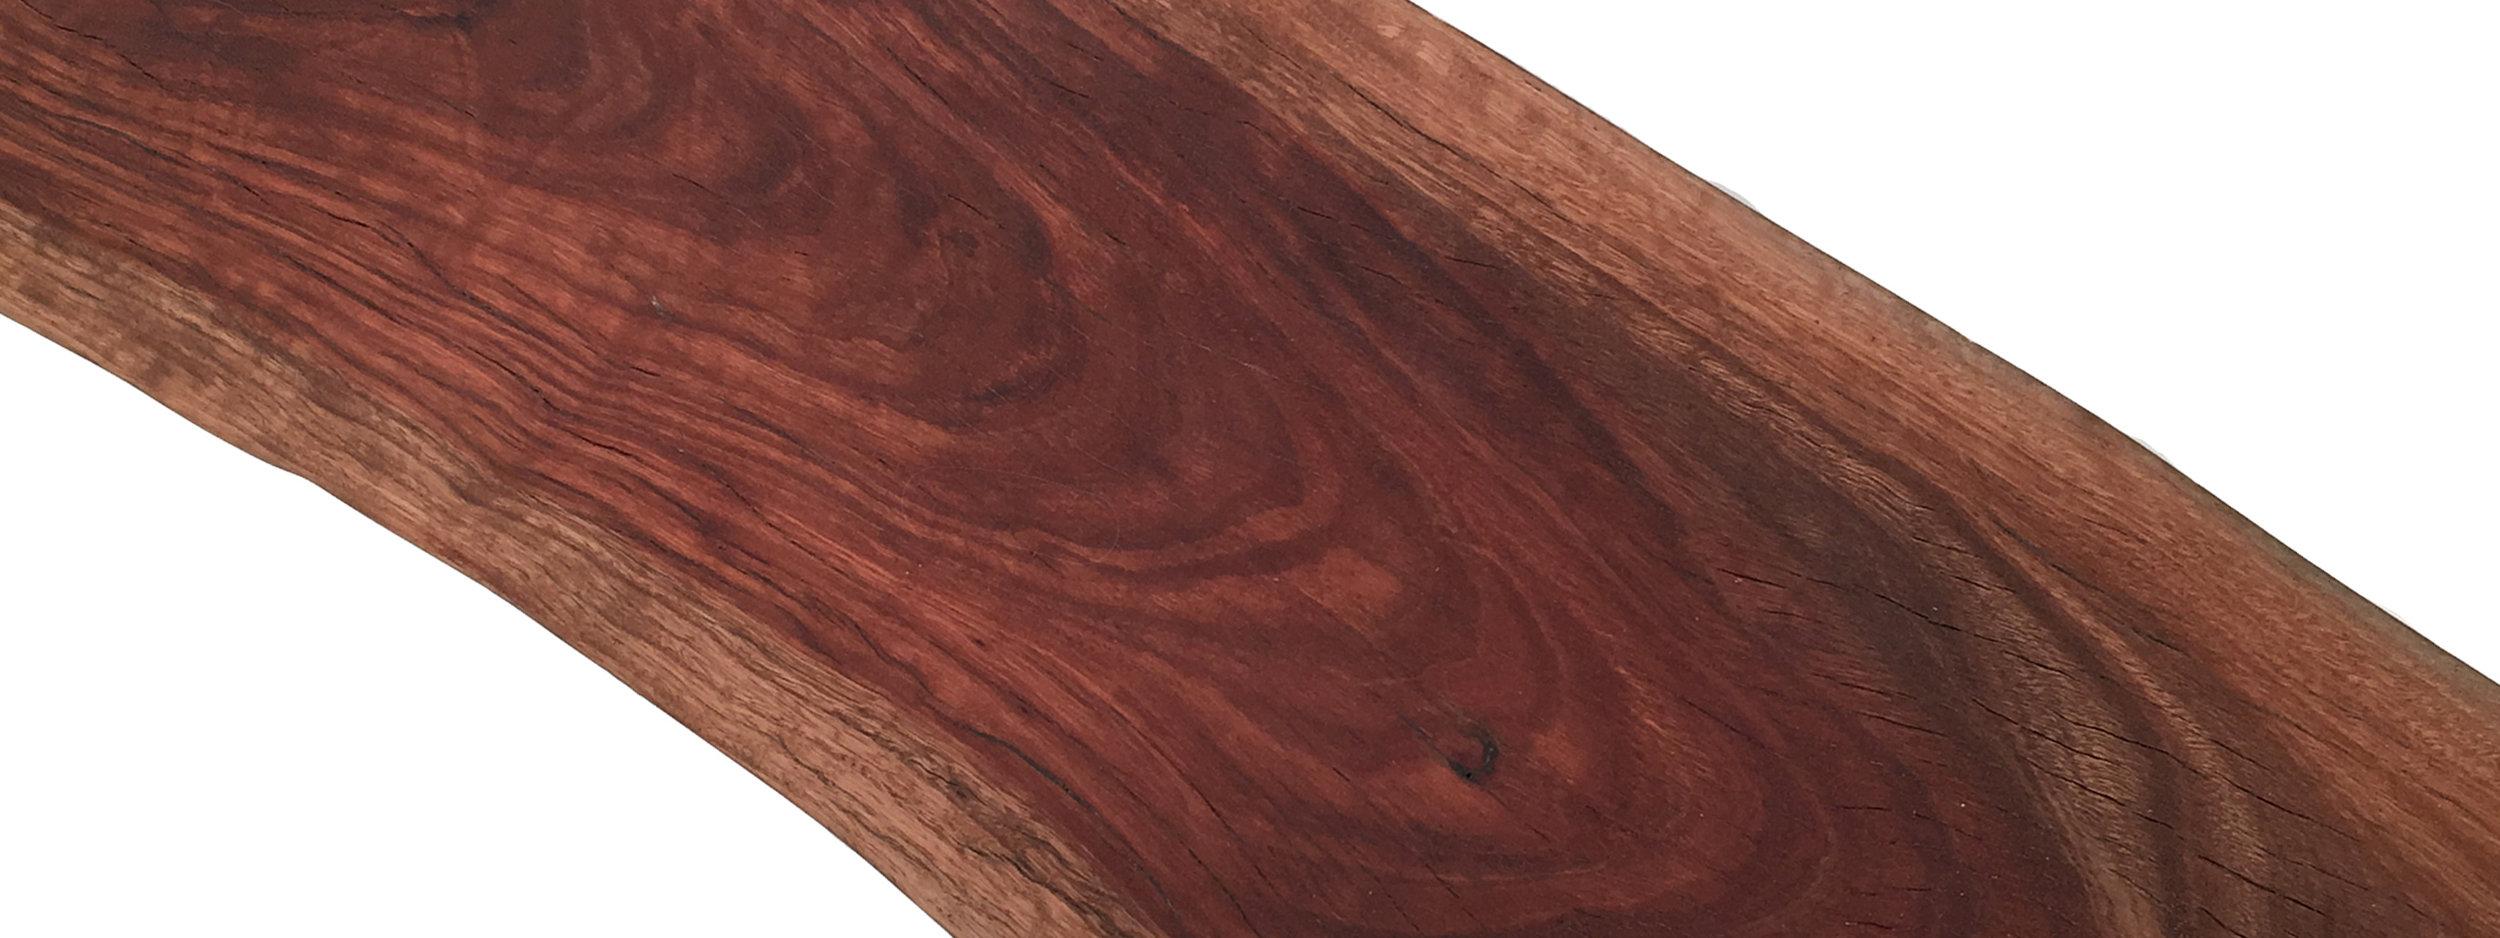 wood image.jpg